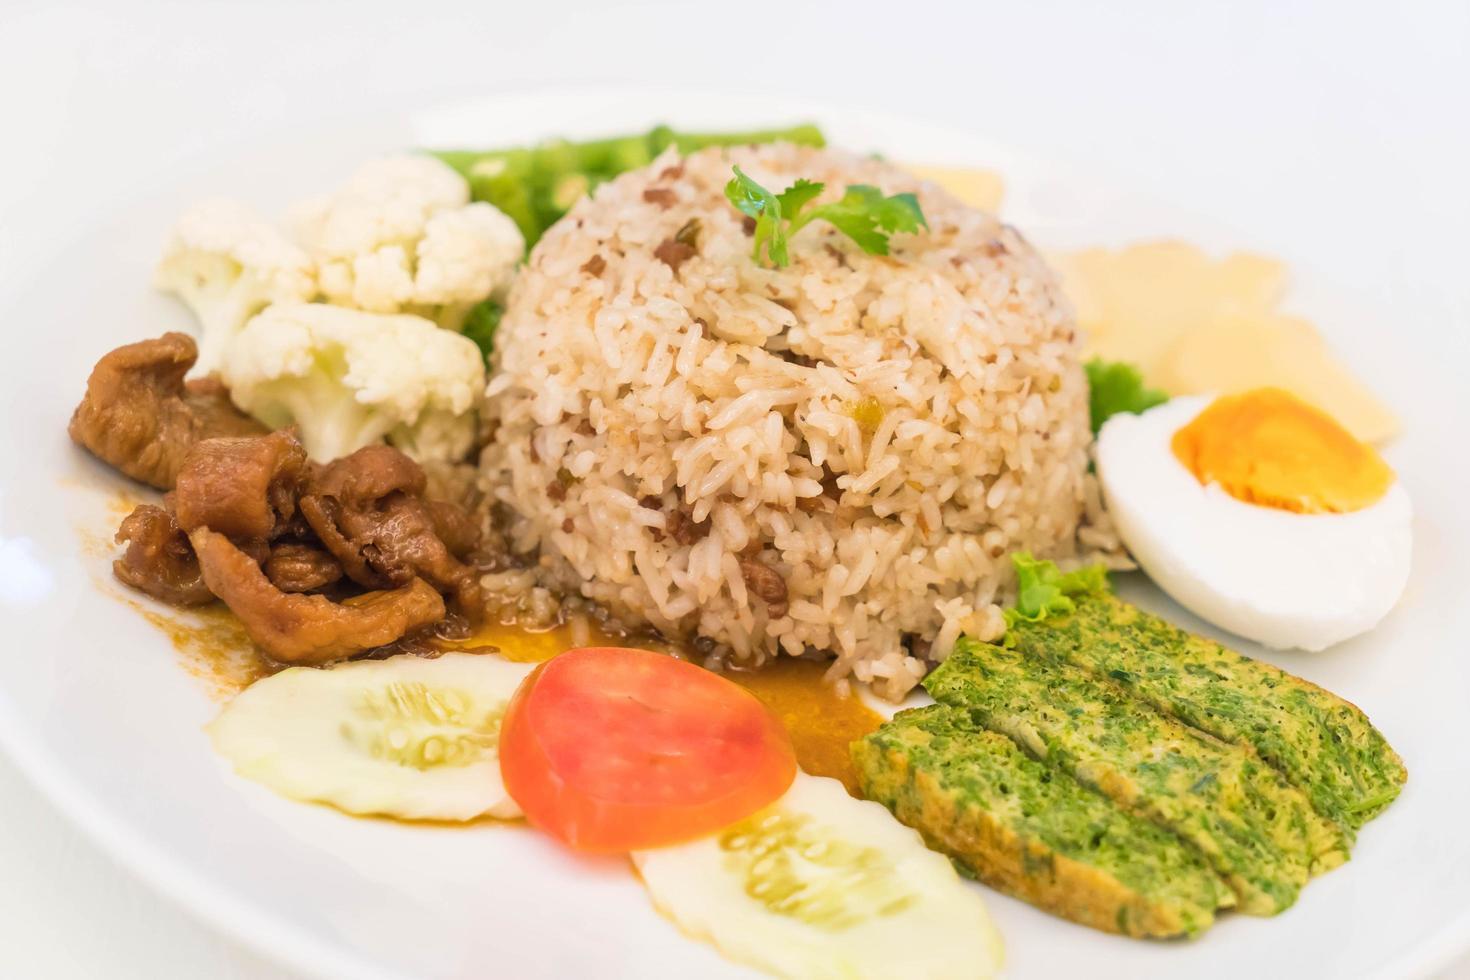 Gebratener Reis mit Garnelenpastensauce foto